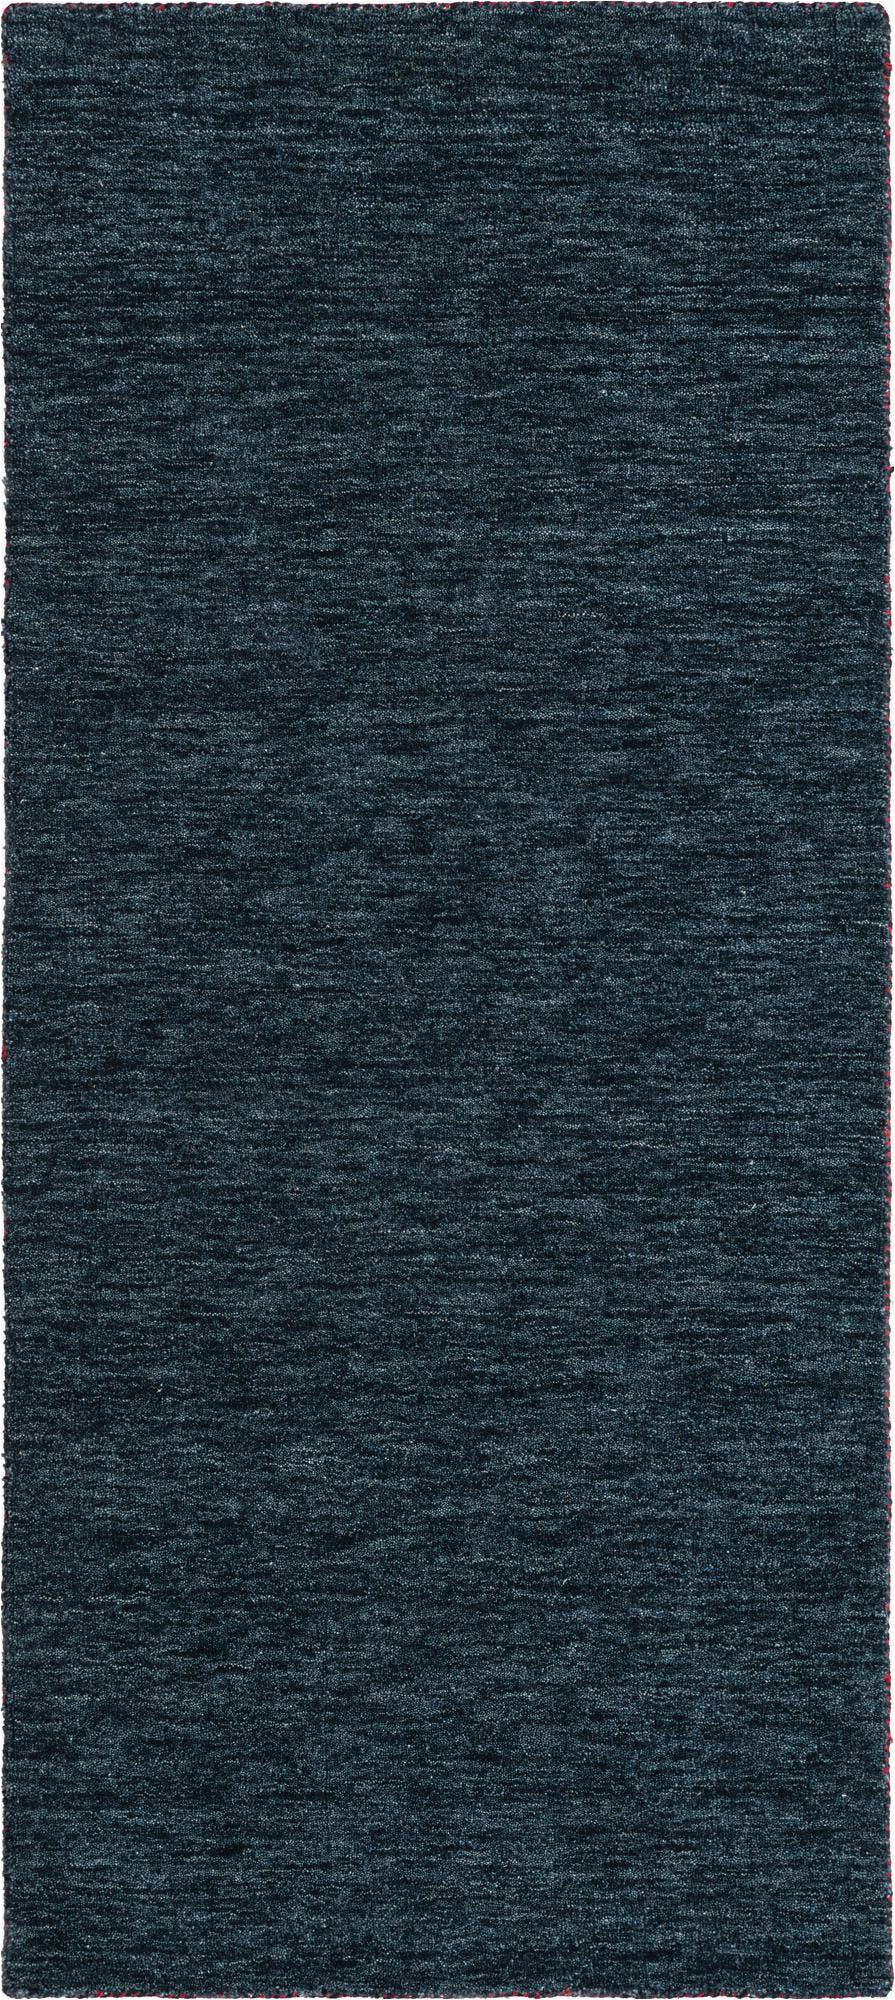 navy blue 6 ft runner solid gabbeh area rug